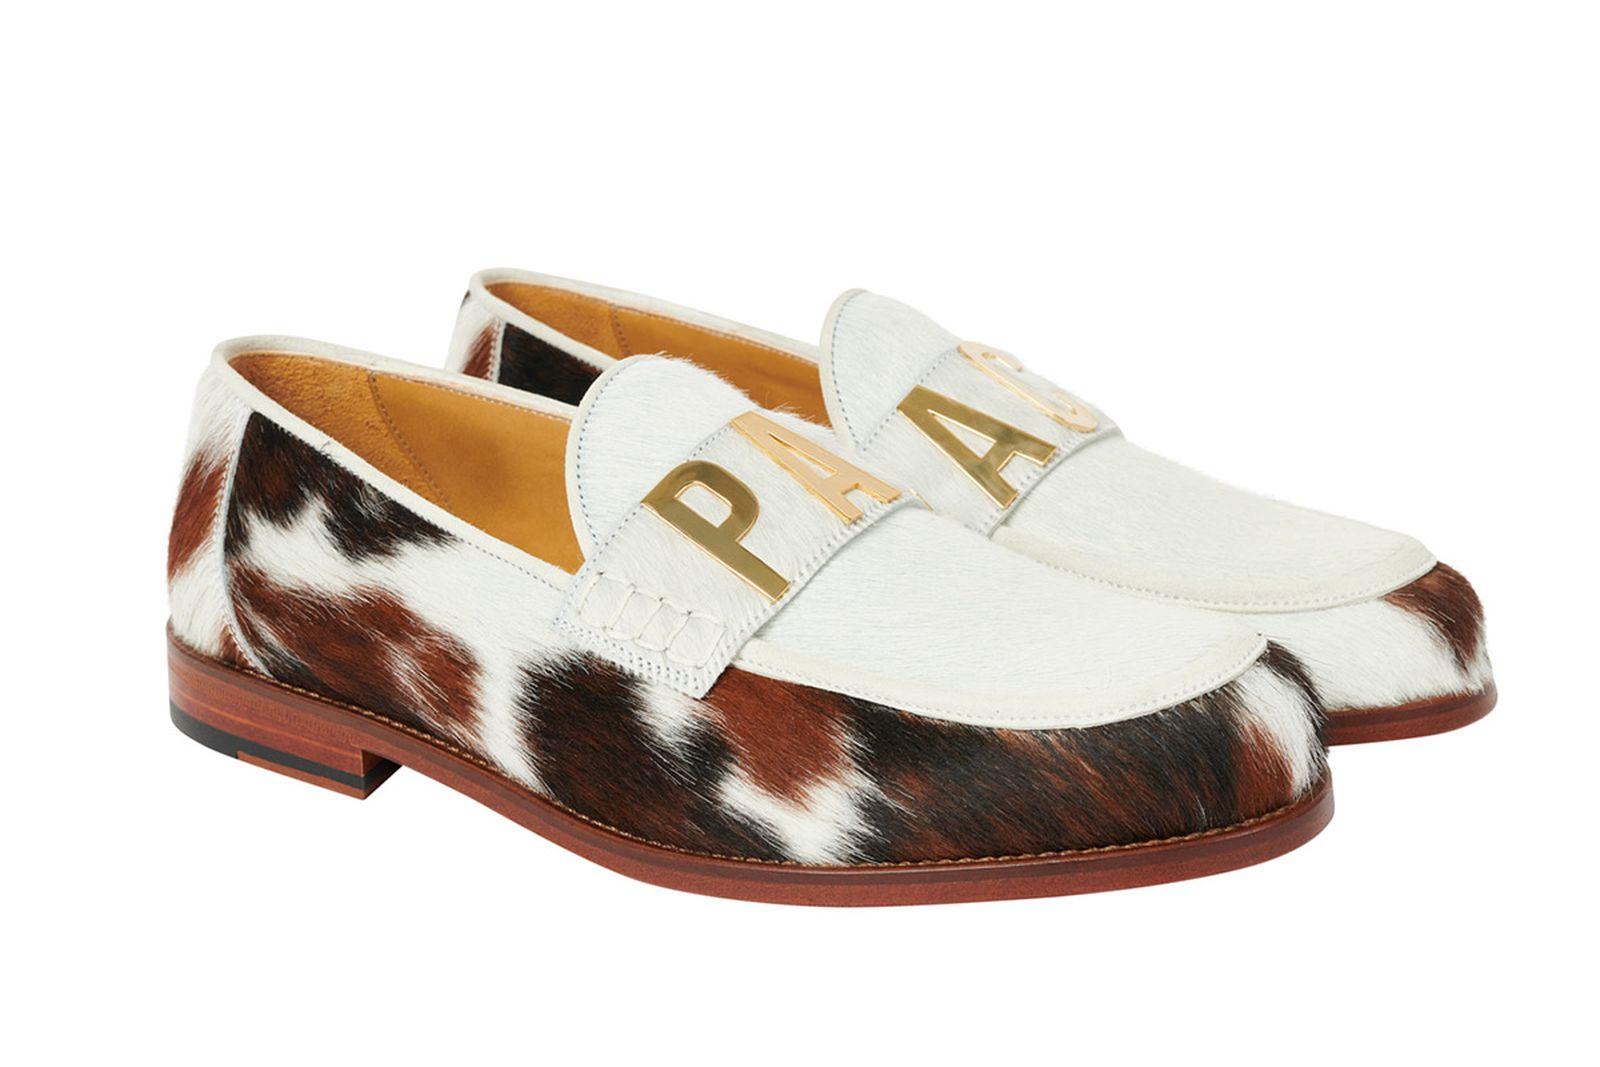 palace-crocs-classic-clog-release-date-price-09